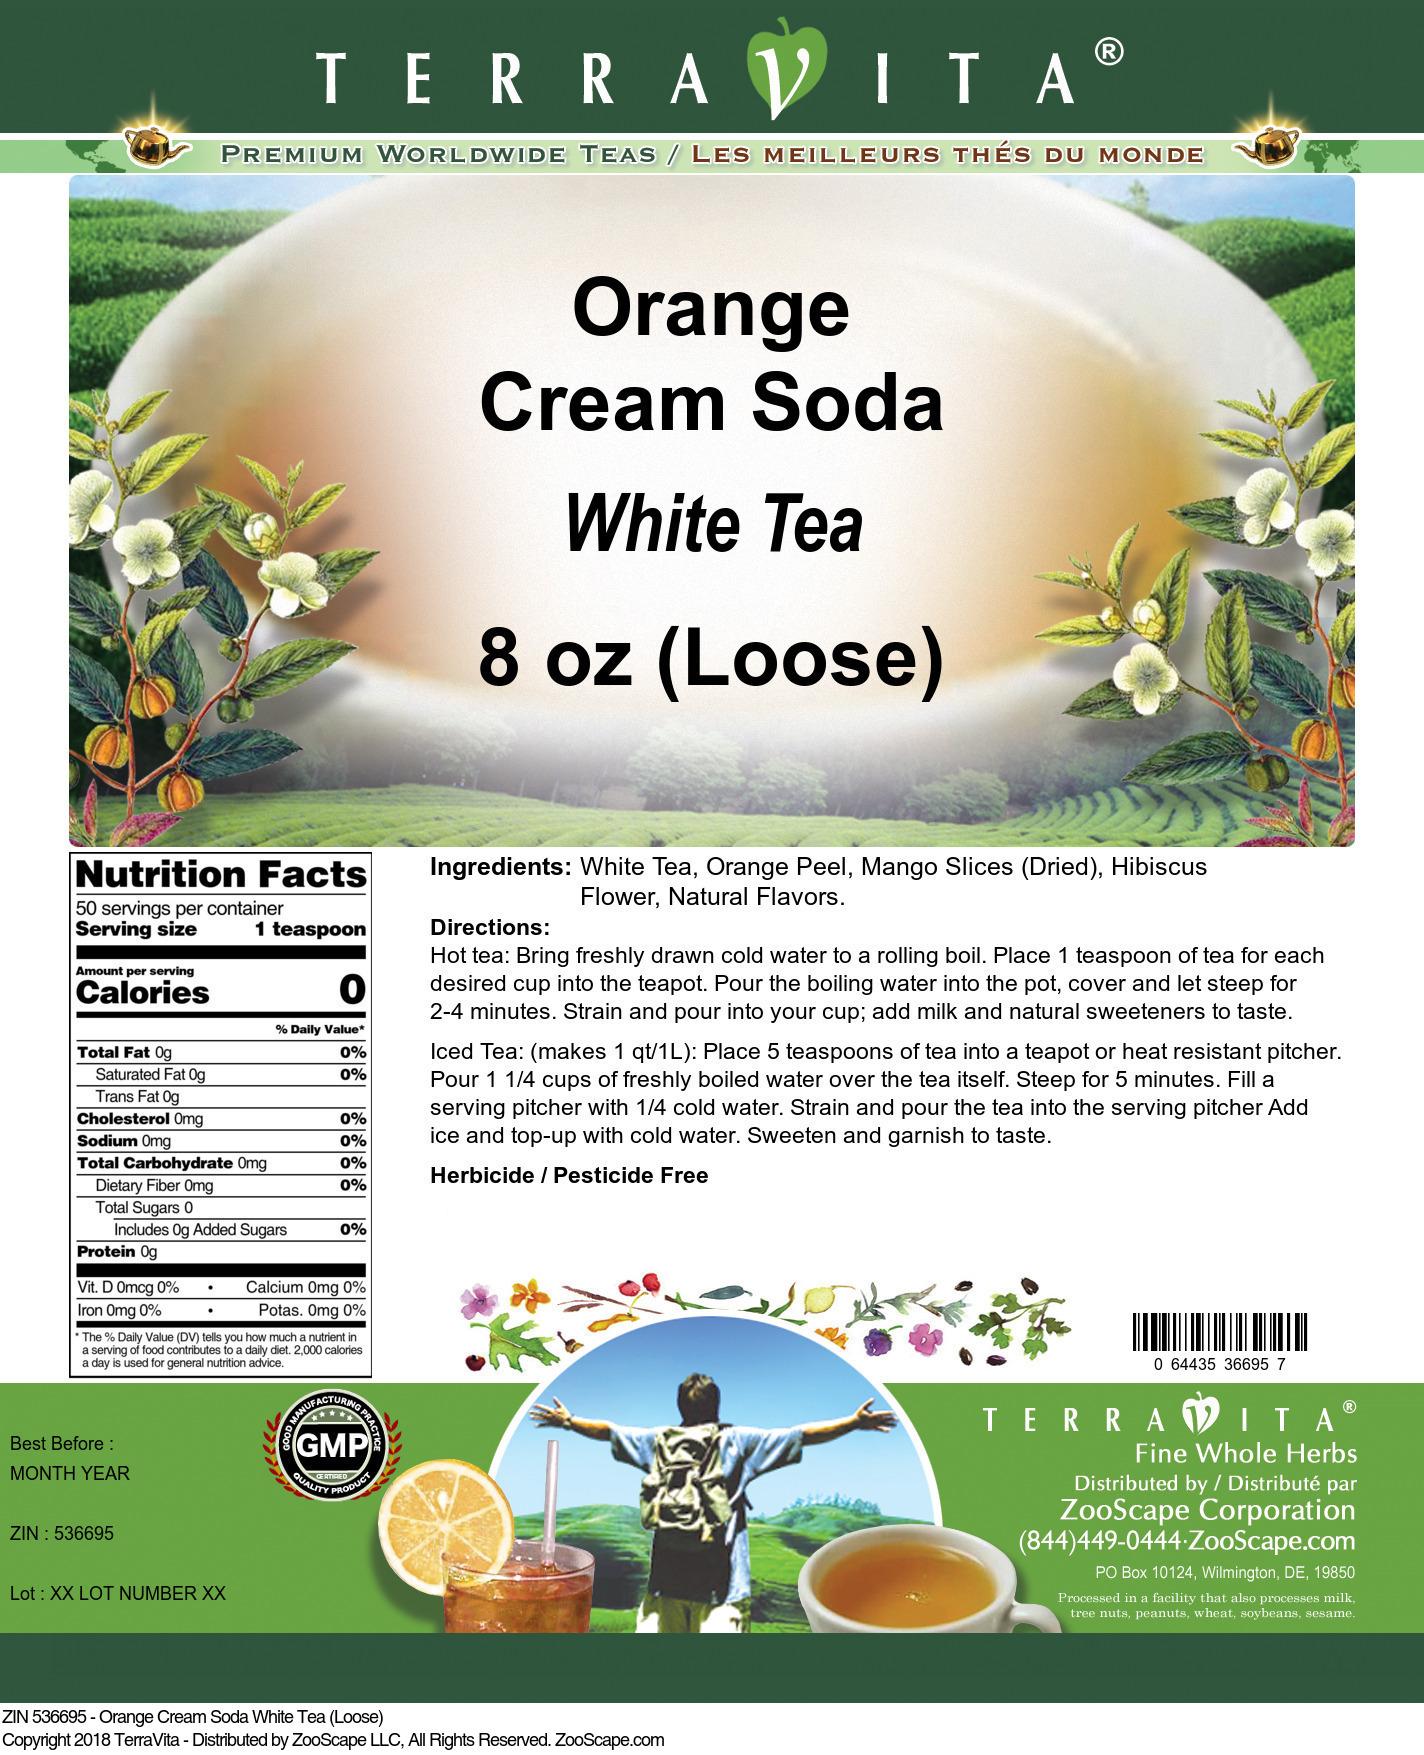 Orange Cream Soda White Tea